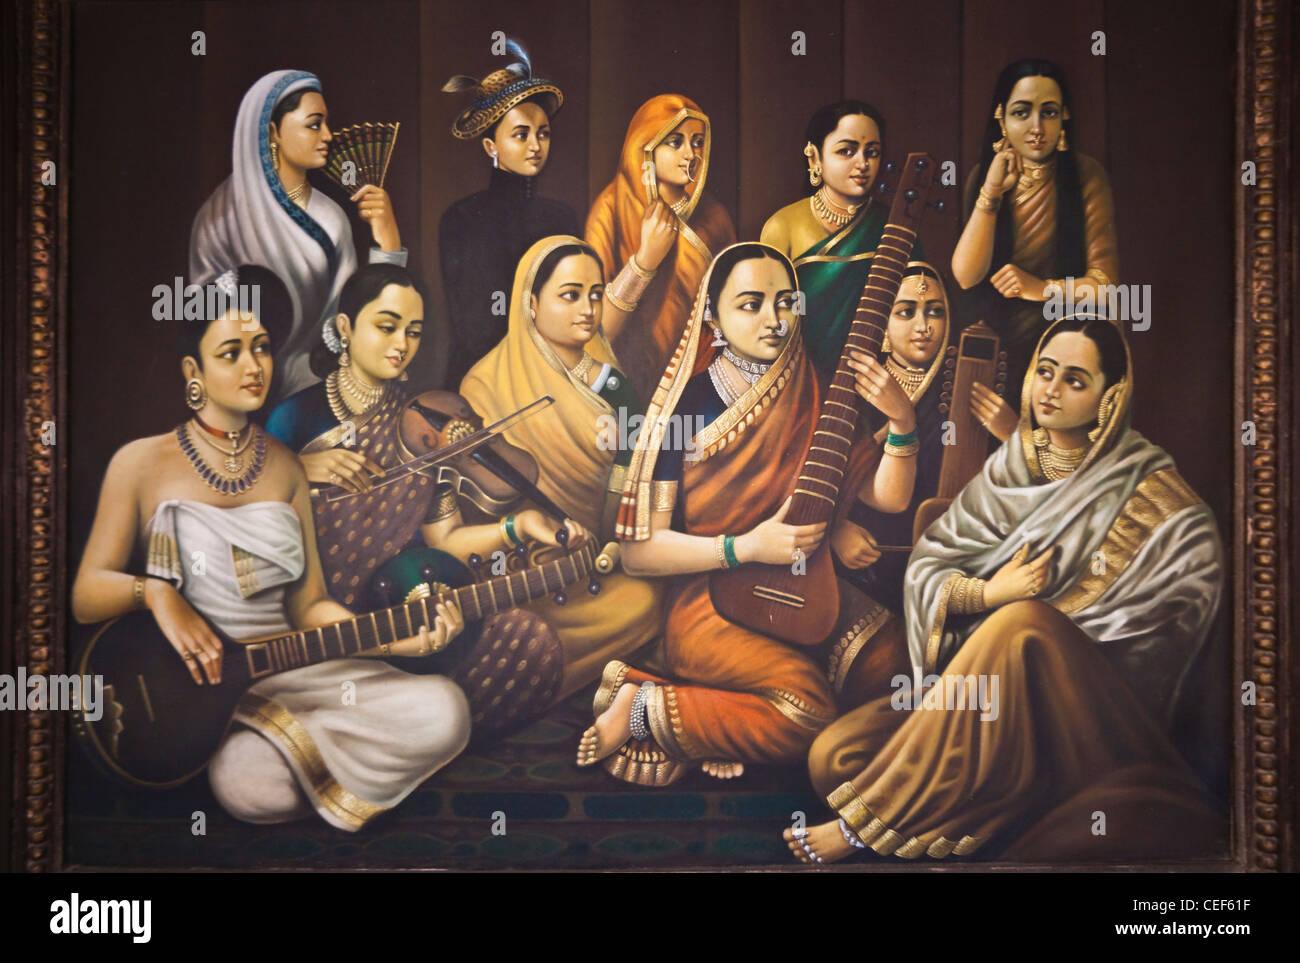 Painting of India girls, Udaipur, Rajasthan, India - Stock Image